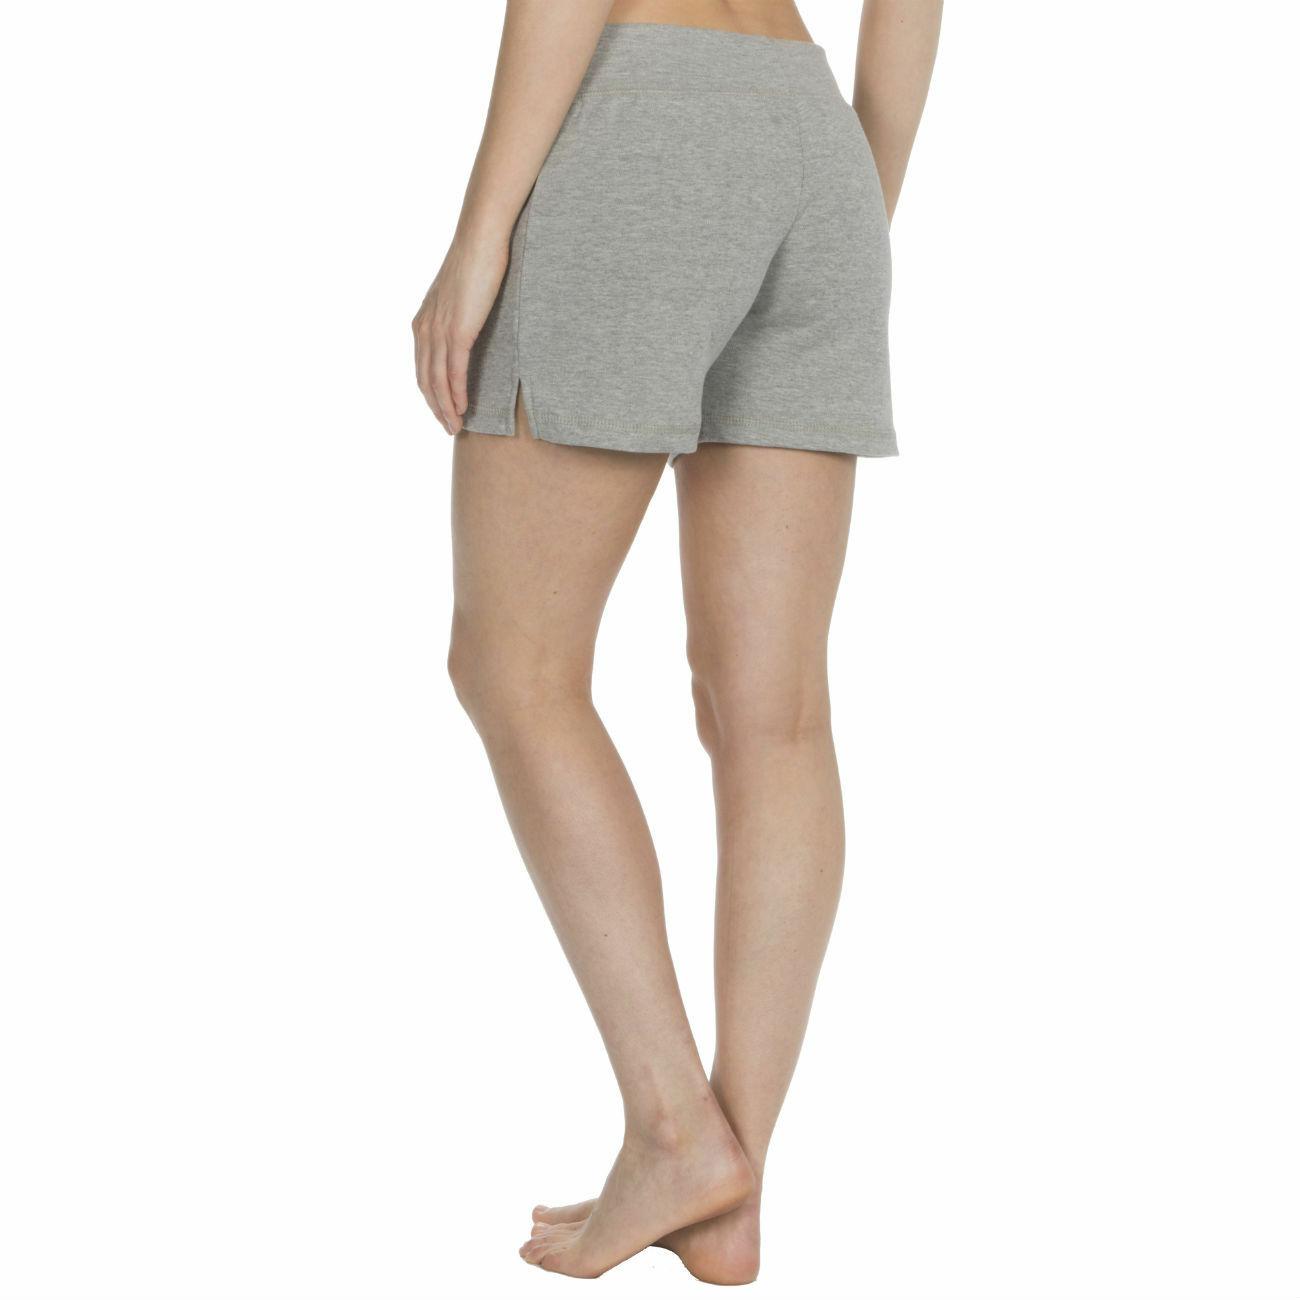 Womens-Cotton-Jersey-Shorts-Elastic-Waist-Summer-Beach-Casual-Yoga-Hot-Pants-New thumbnail 9